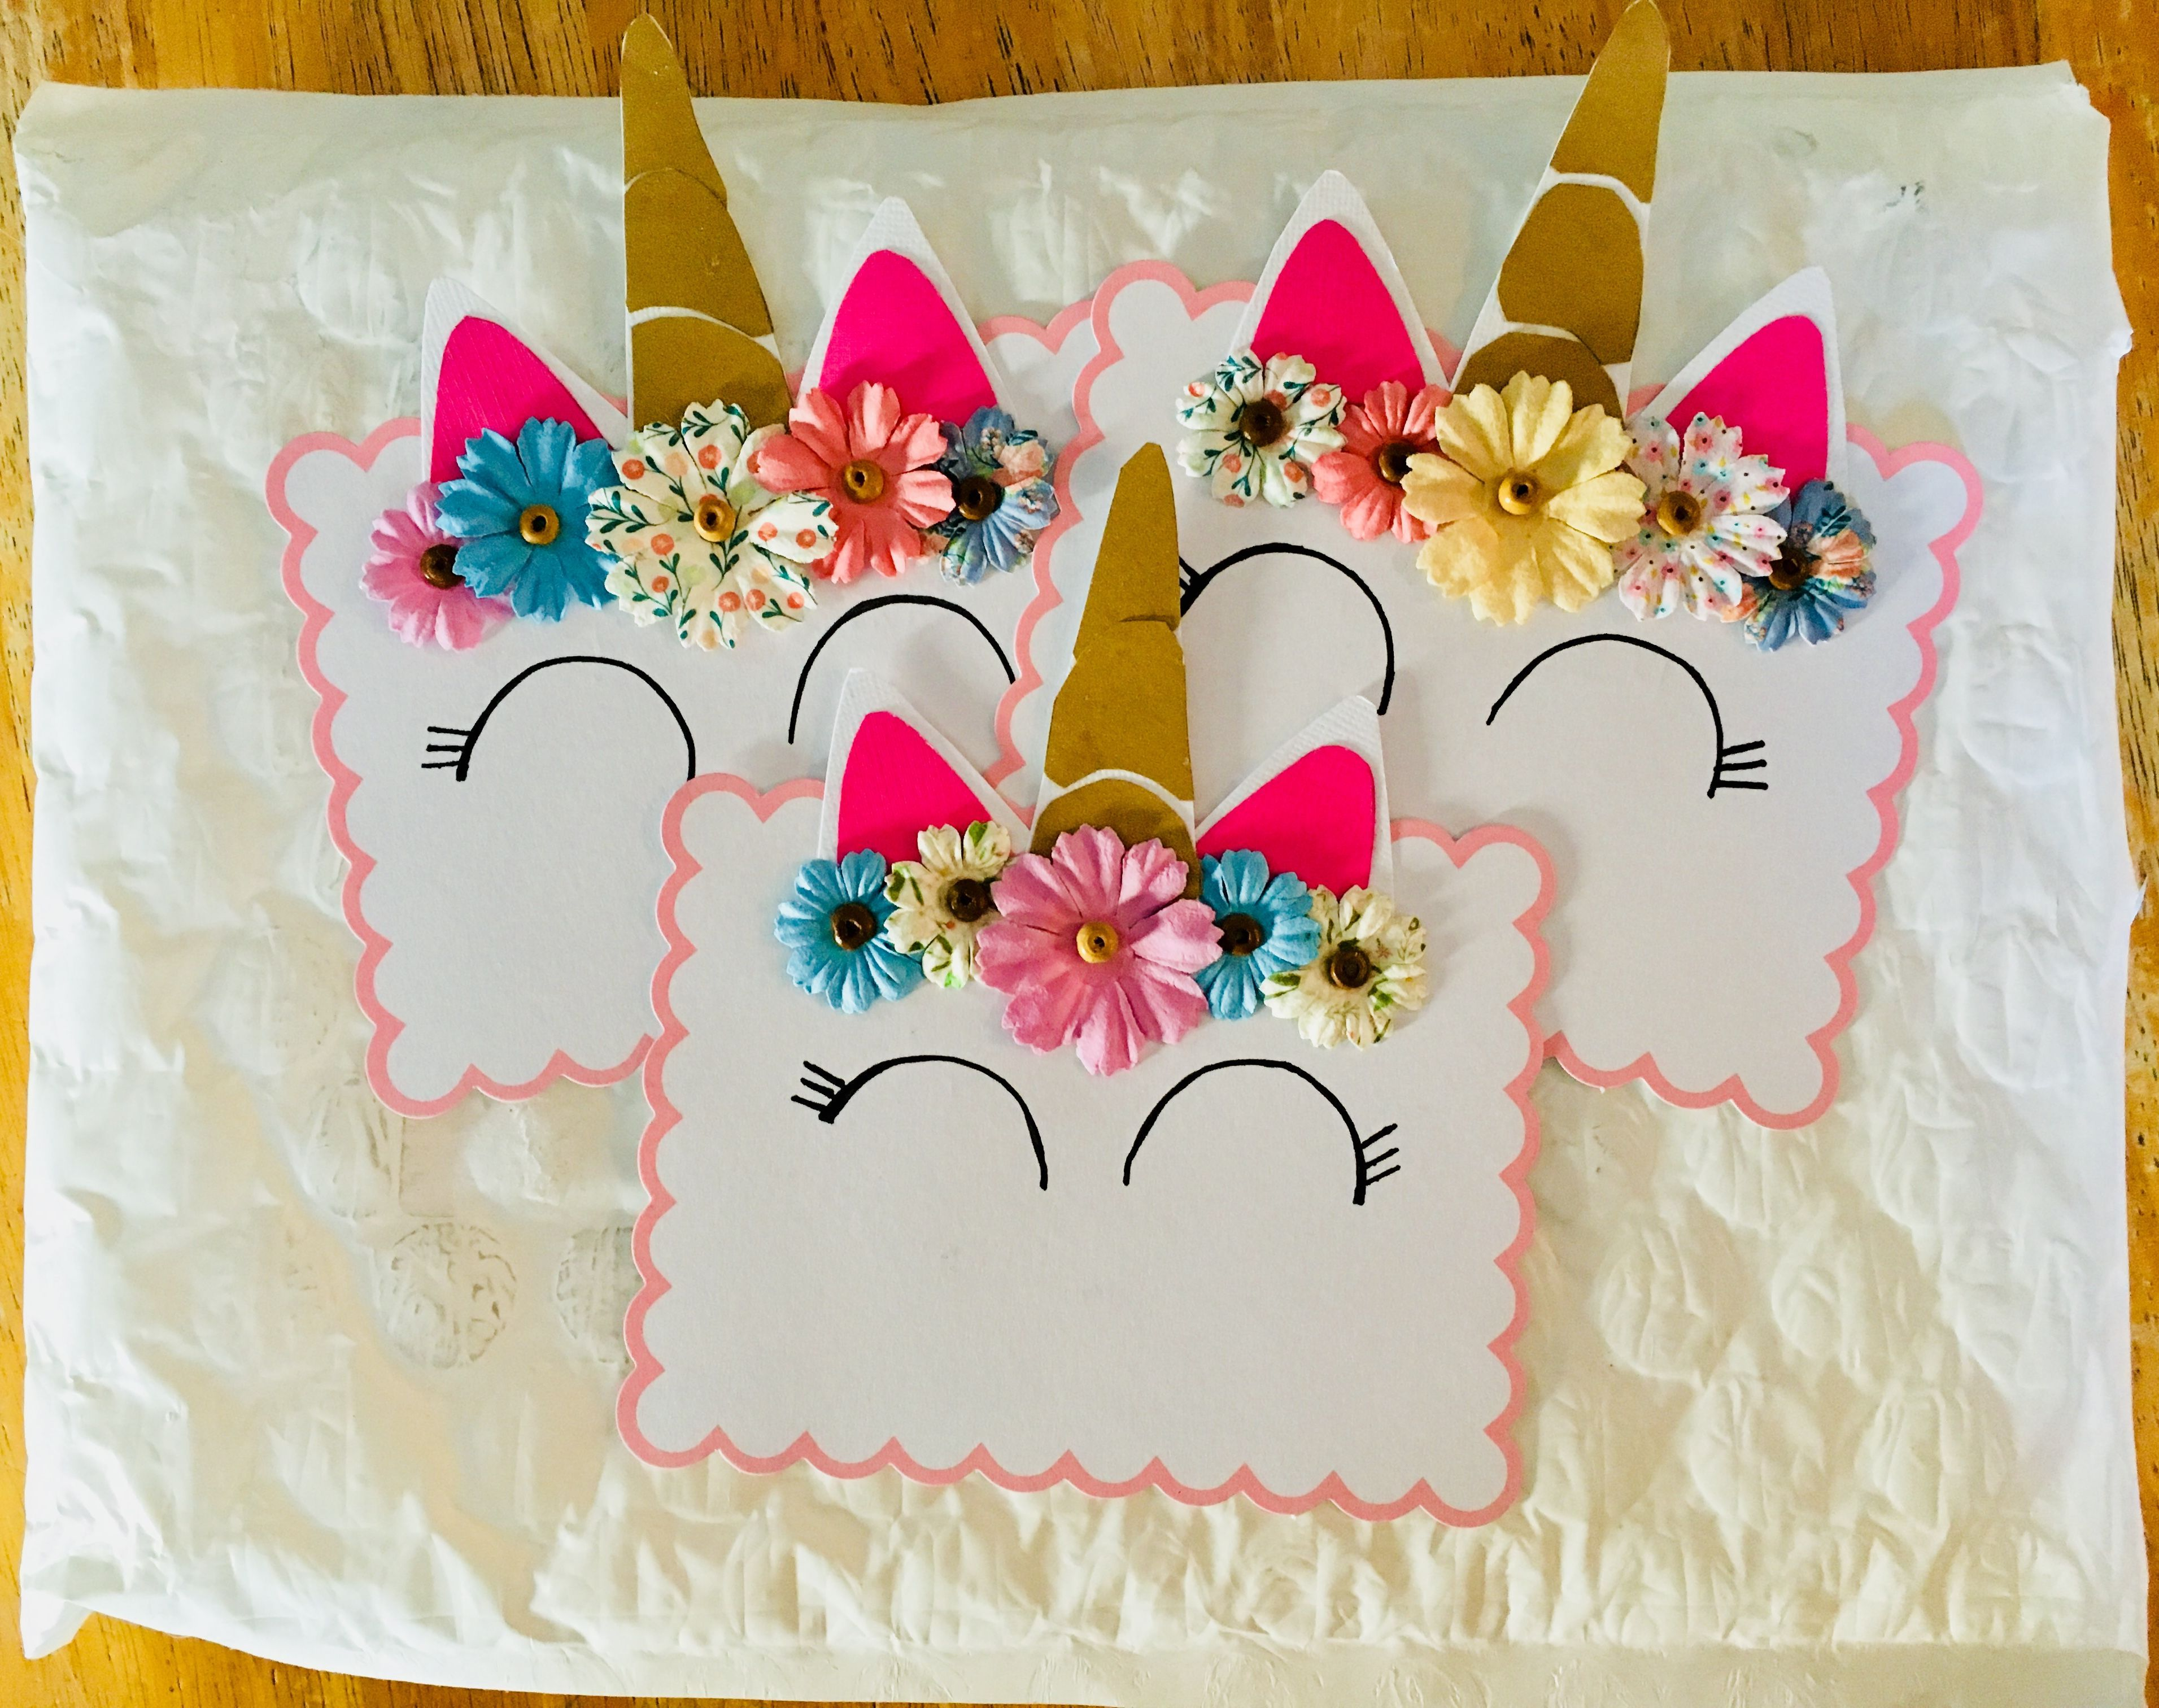 Unicorn Birthday Party Invitation Diy For My Little Girls Bday Design 2019 Unicorn Invitations Diy Birthday Party Invitations Diy Unicorn Invitations